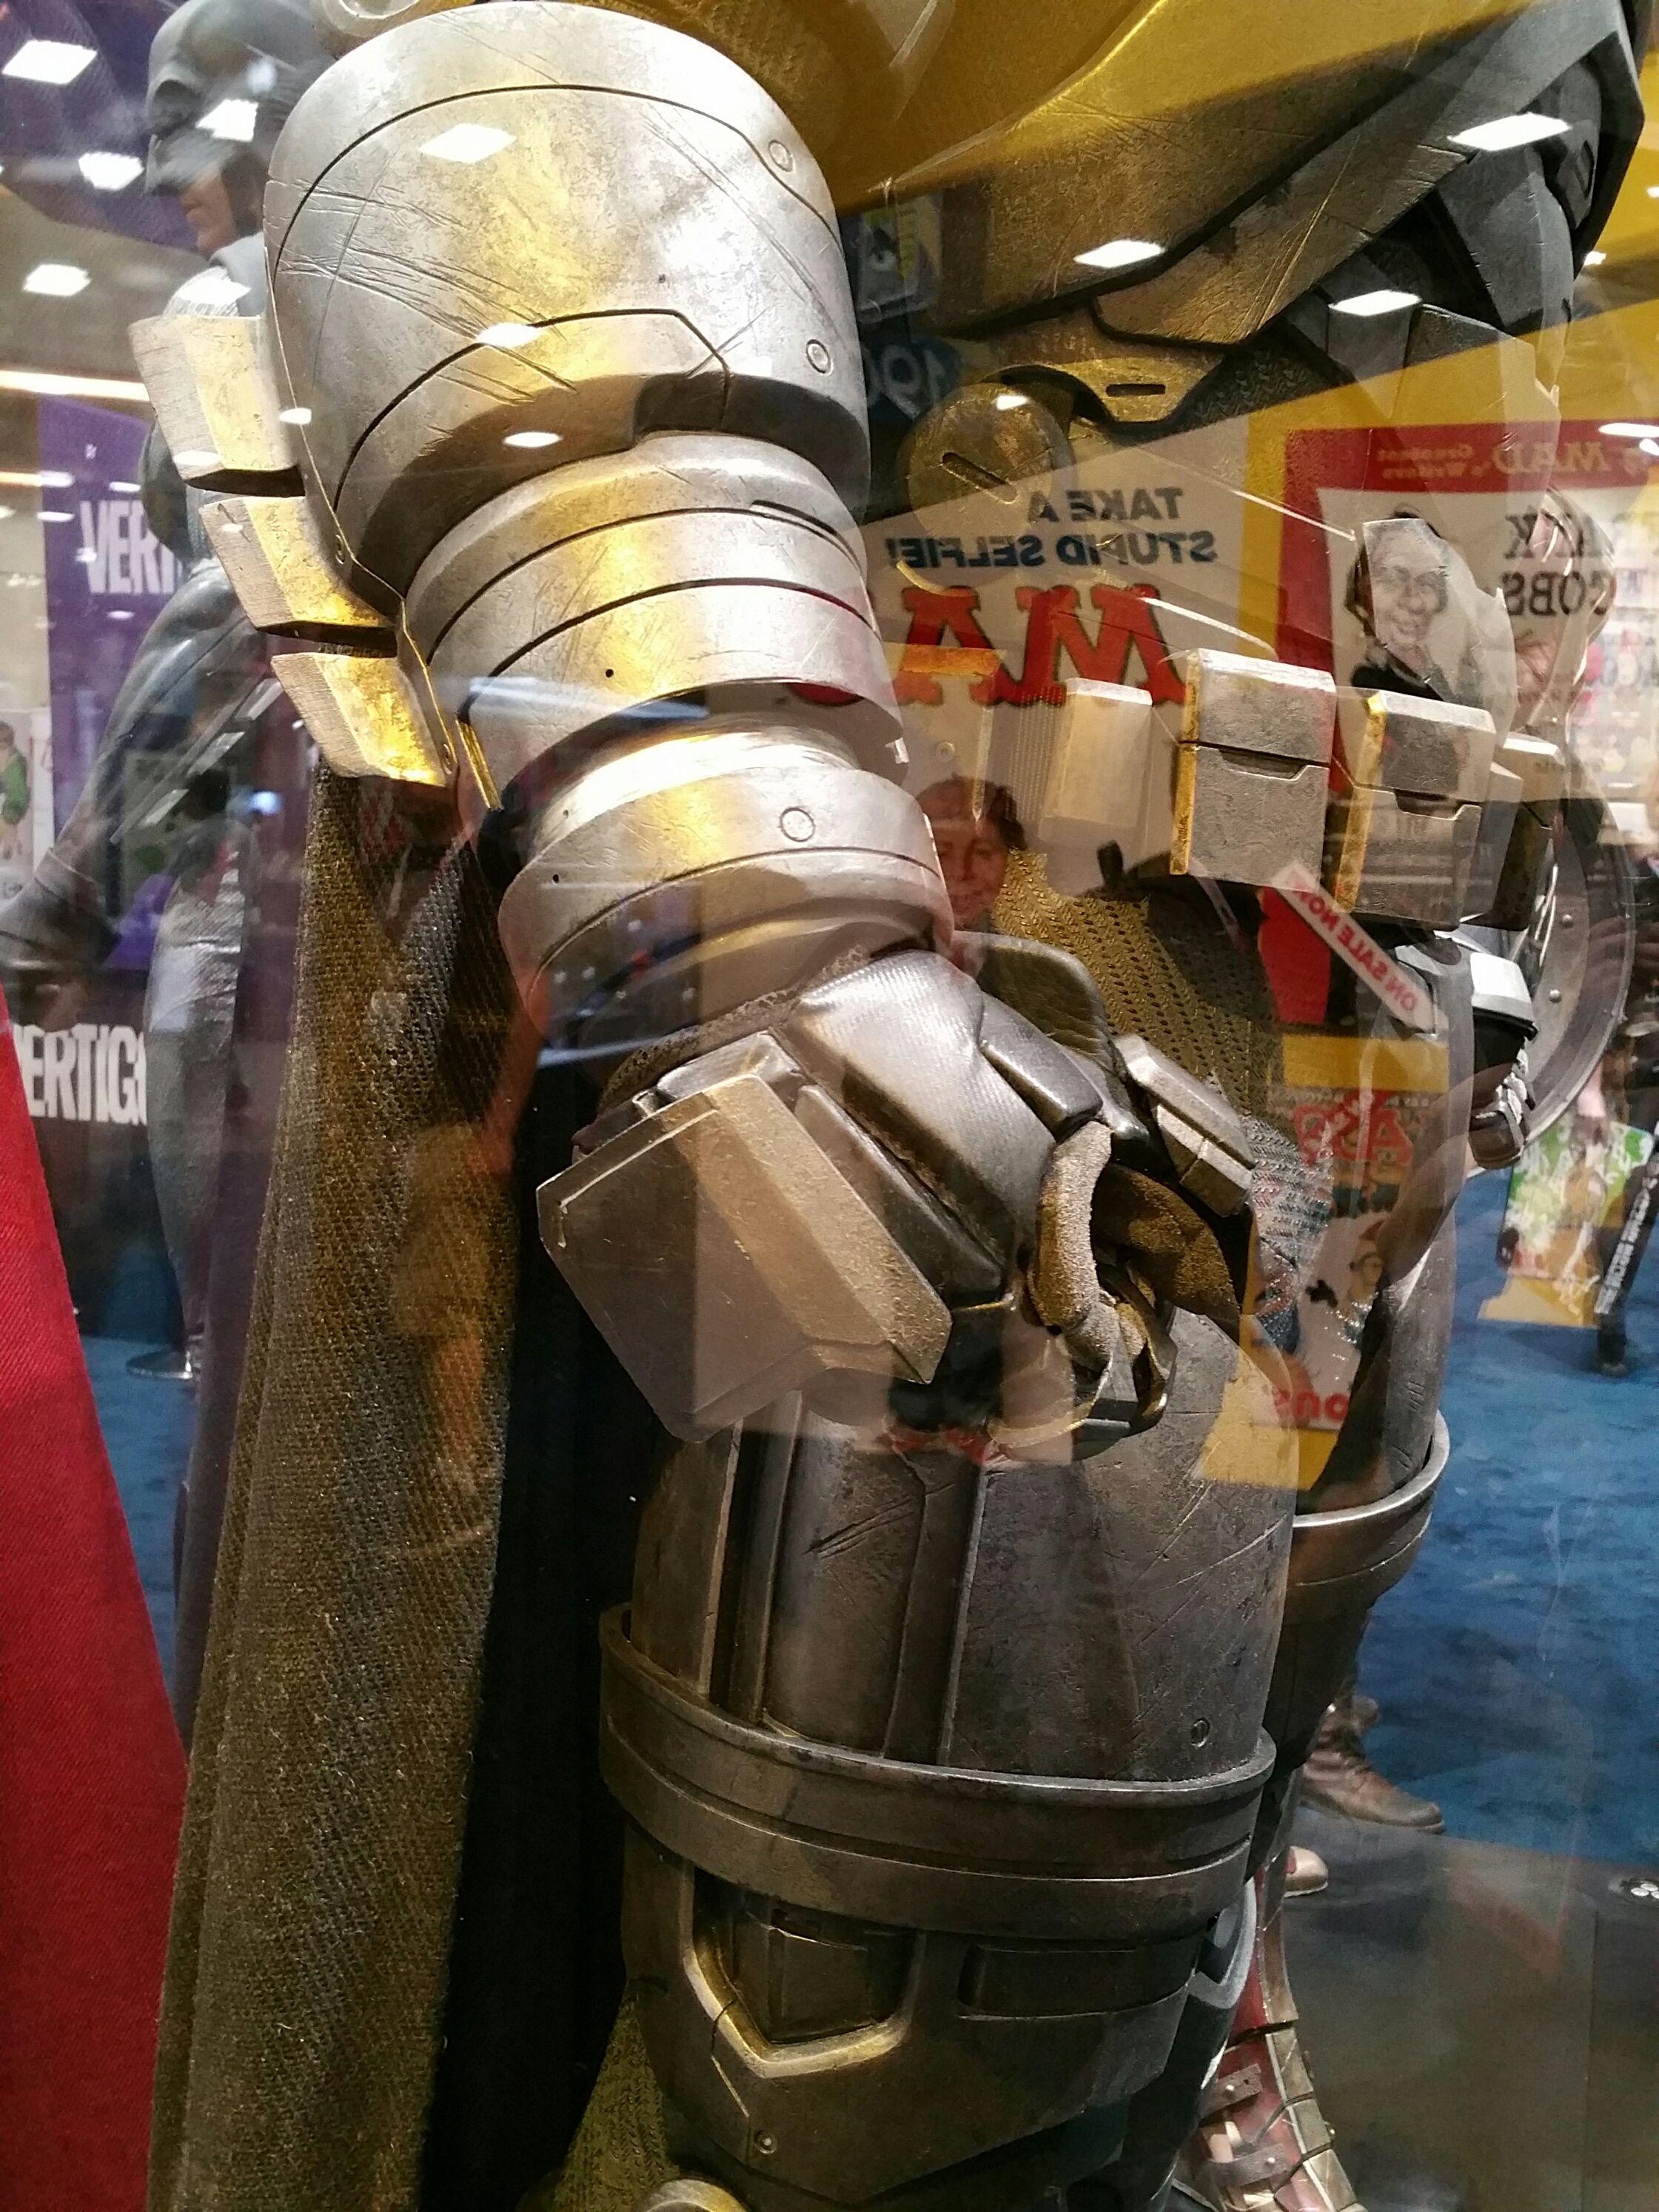 batman-v-superman-armor-comic-con-image1.jpg (2241×2988)